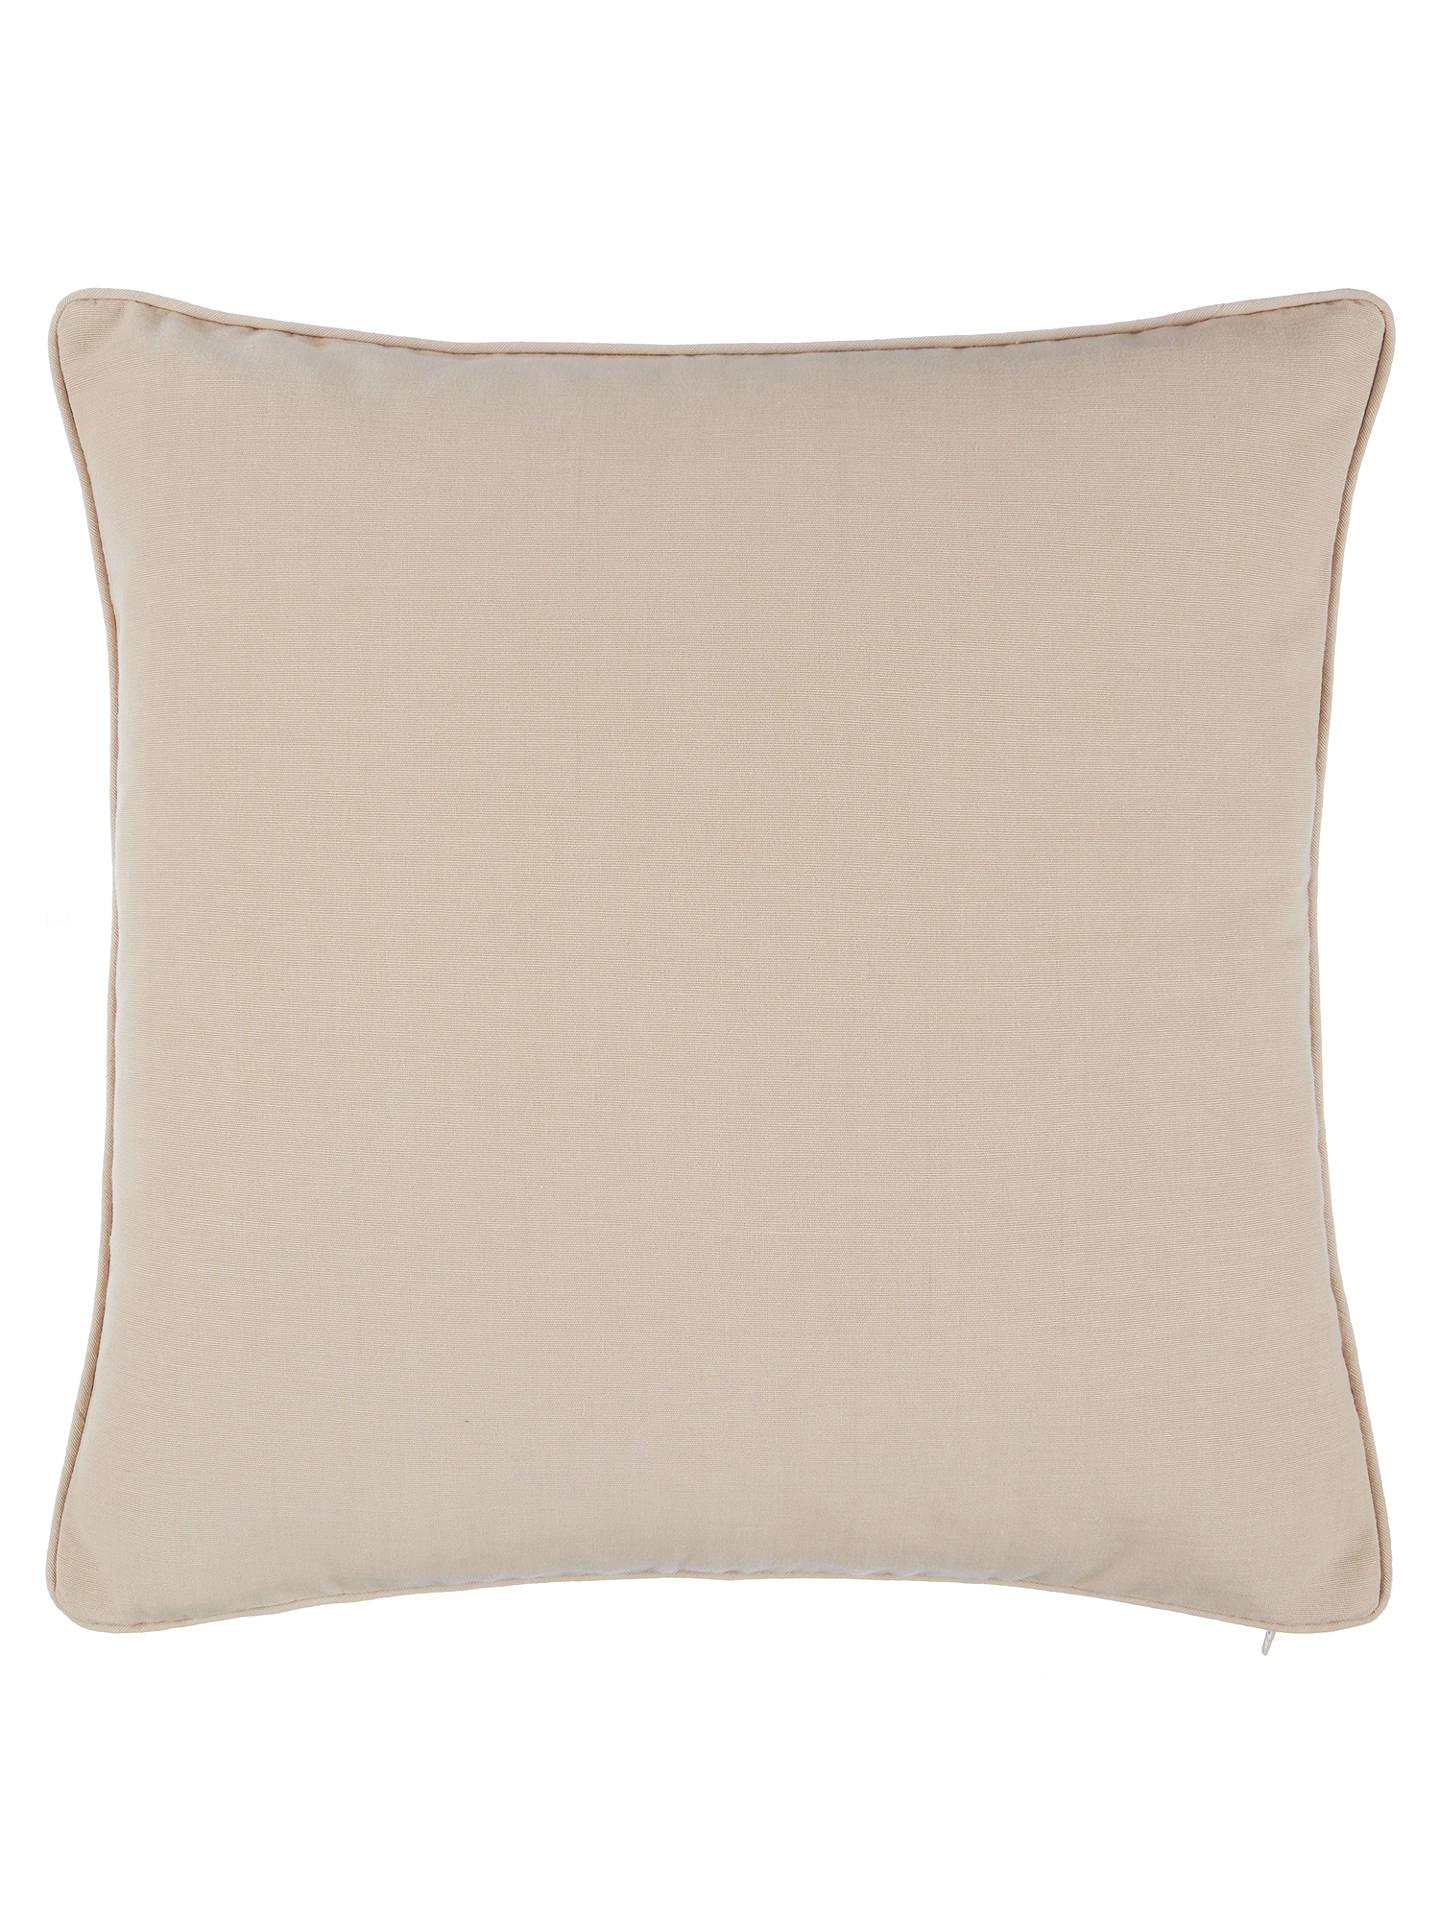 john lewis cotton rib cushion at john lewis partners. Black Bedroom Furniture Sets. Home Design Ideas